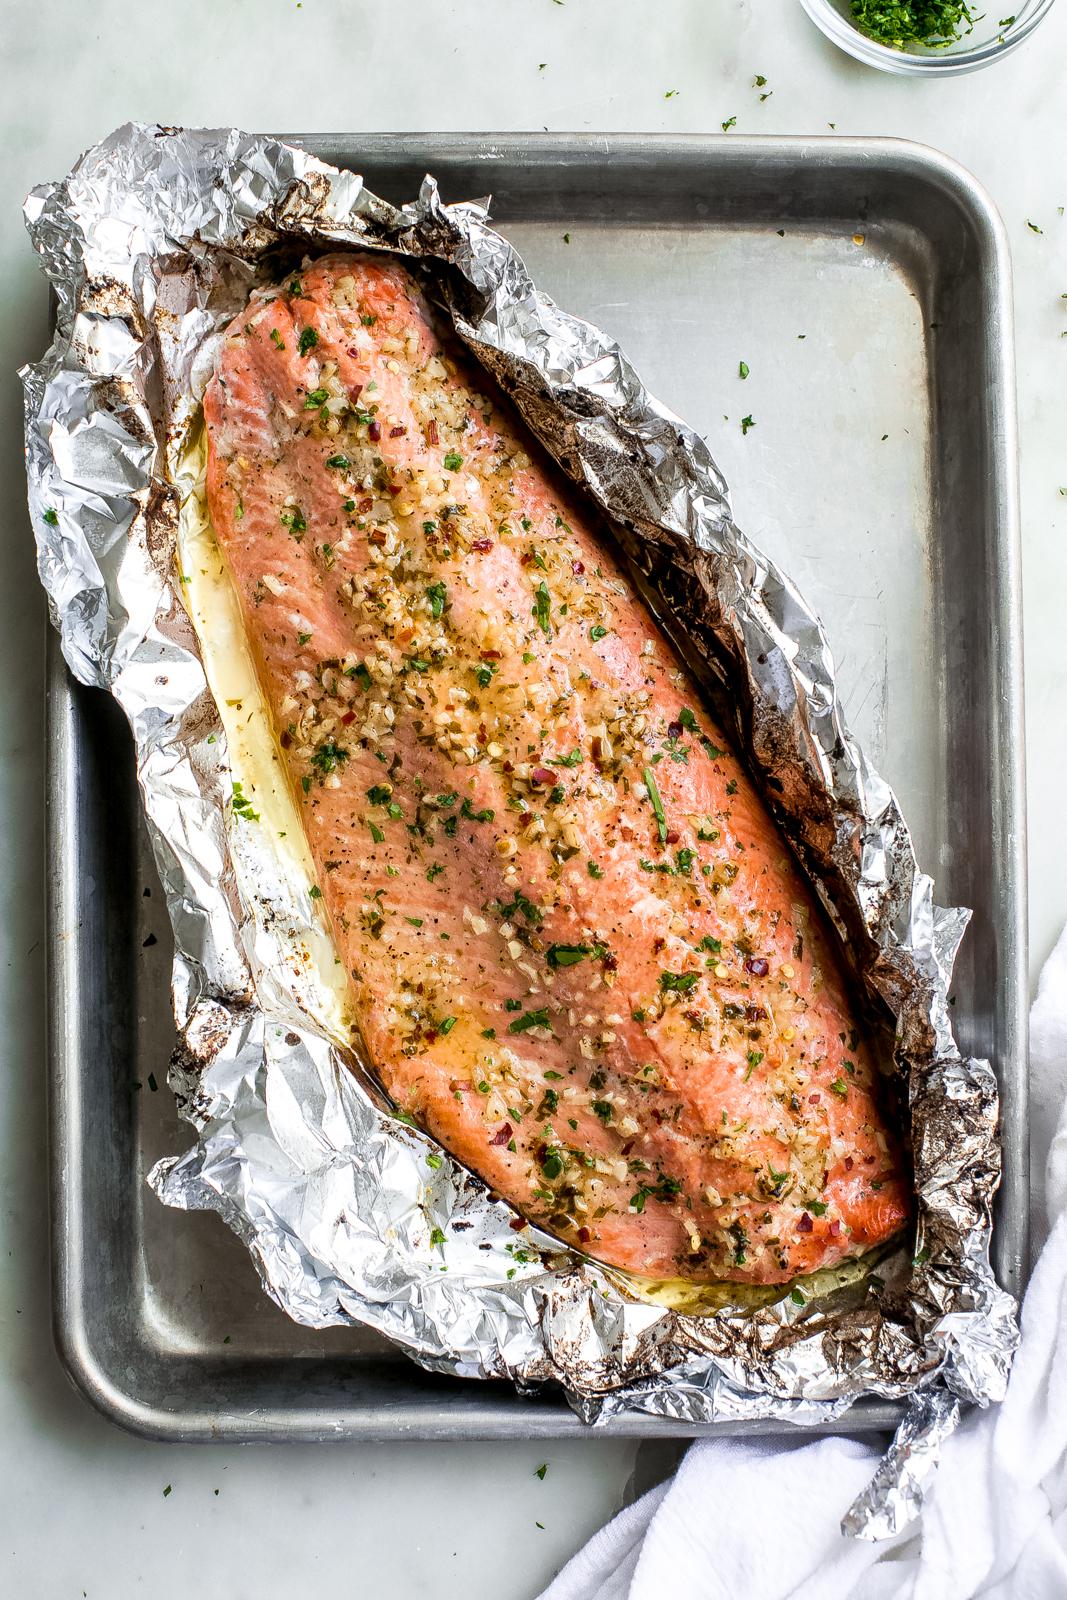 salmon filet prepared in foil on baking sheet pan